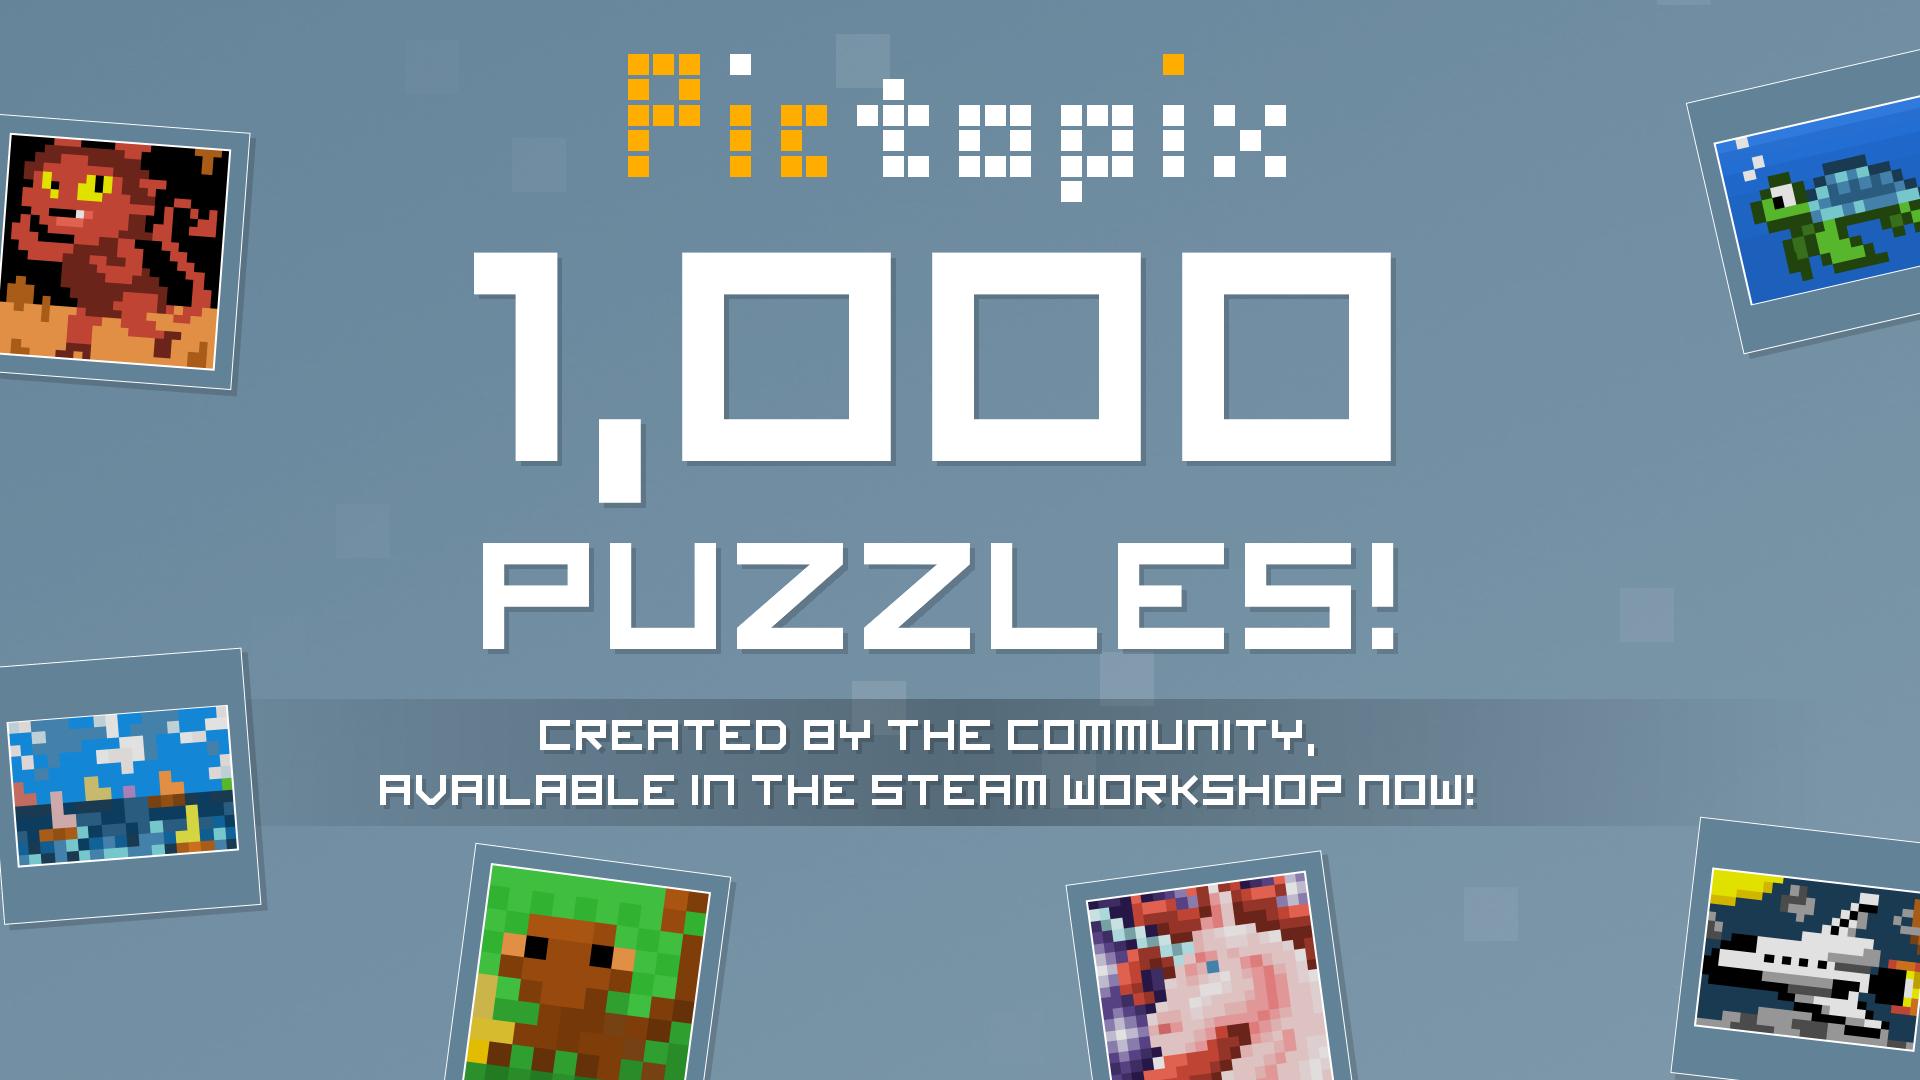 logo 1000 puzzles